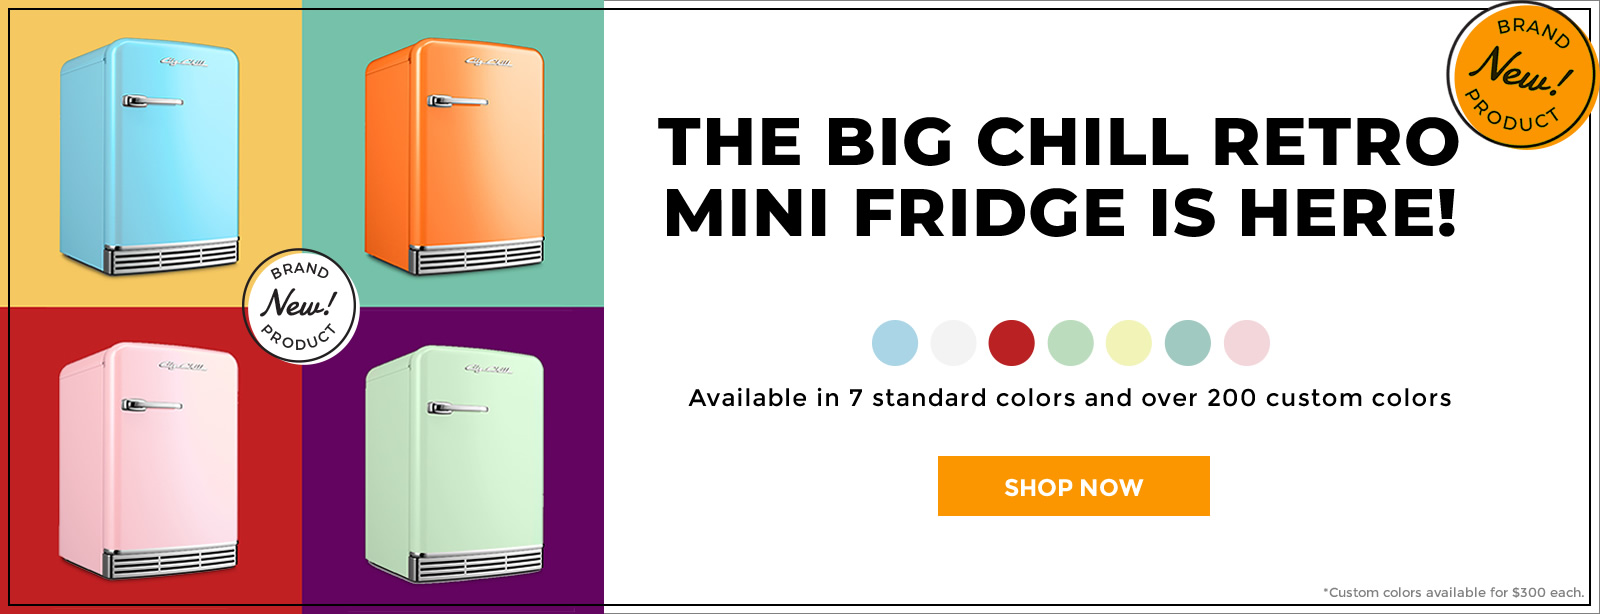 New Mini Fridge 1600 Banner